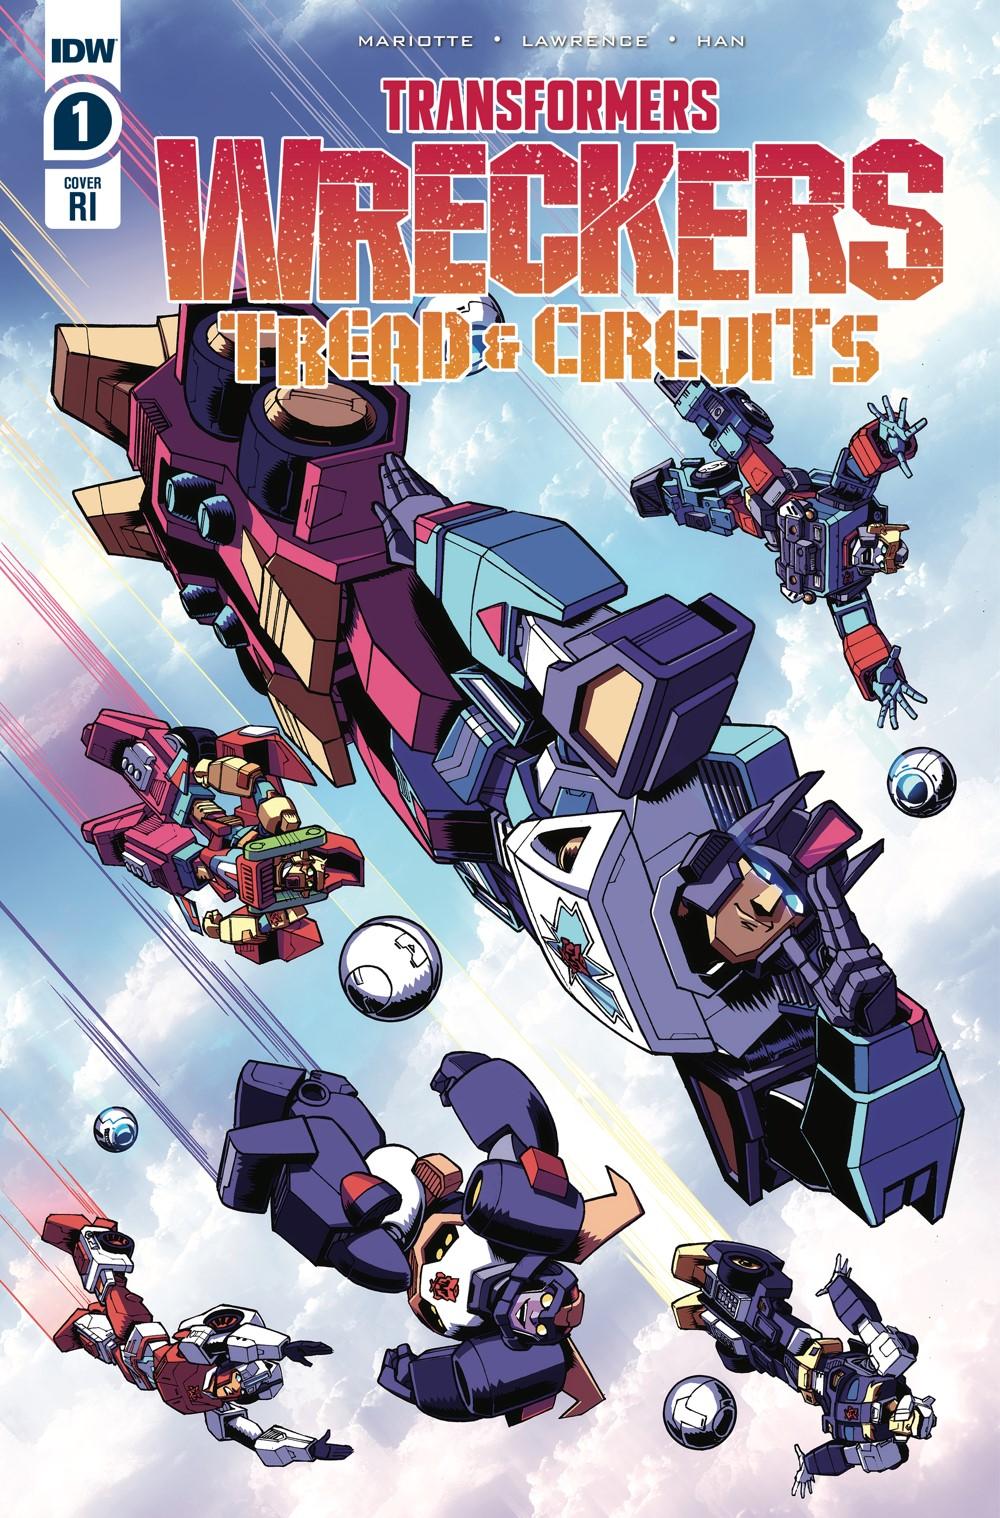 TF-Wreckers-TnC01_cvrRI ComicList: IDW Publishing New Releases for 10/13/2021